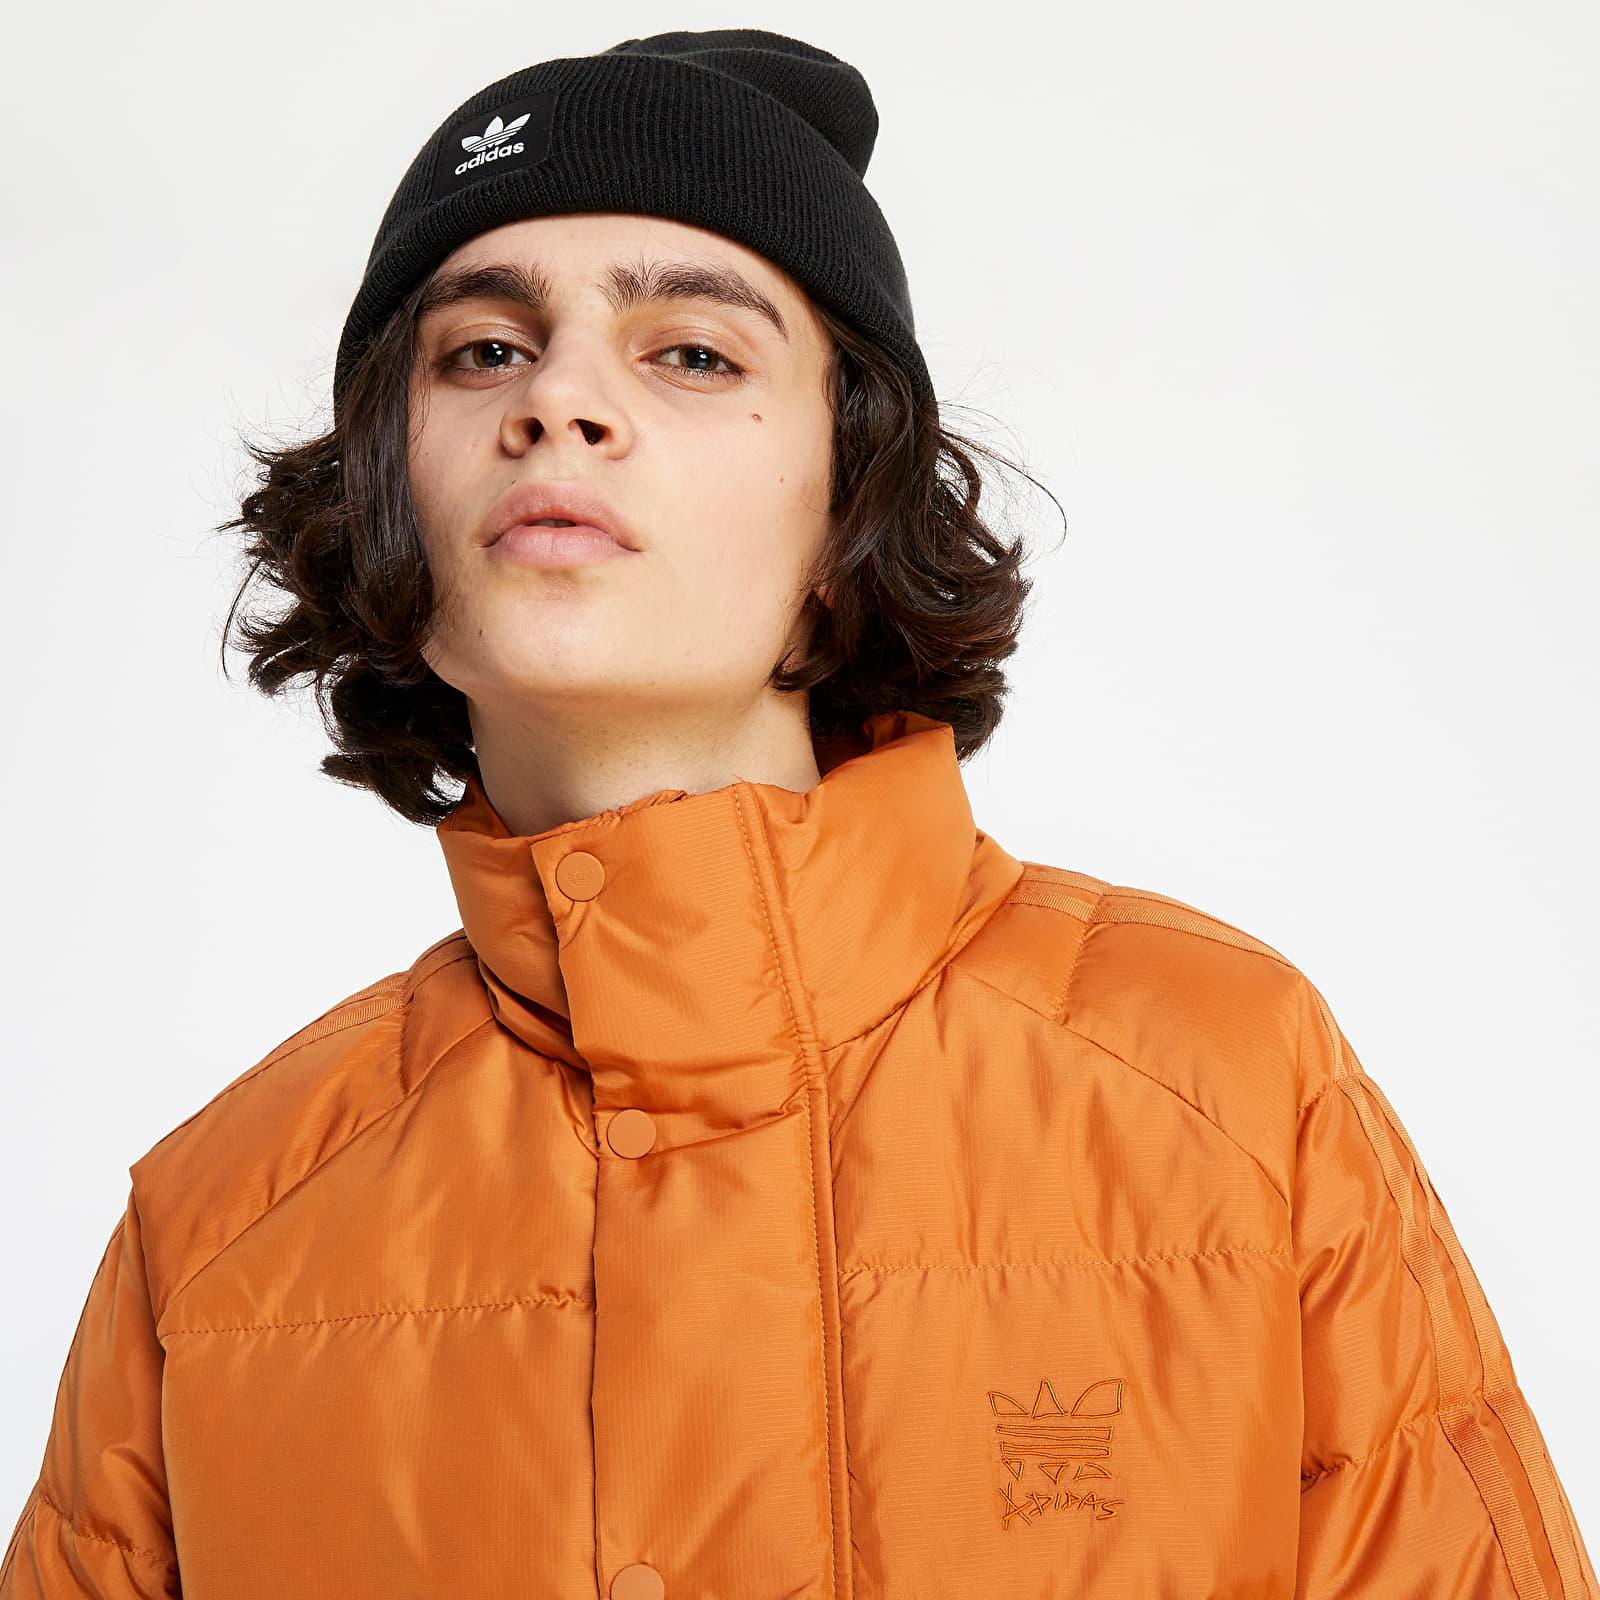 adidas x Jonah Hill Puff Jacket Tech Copper EUR M